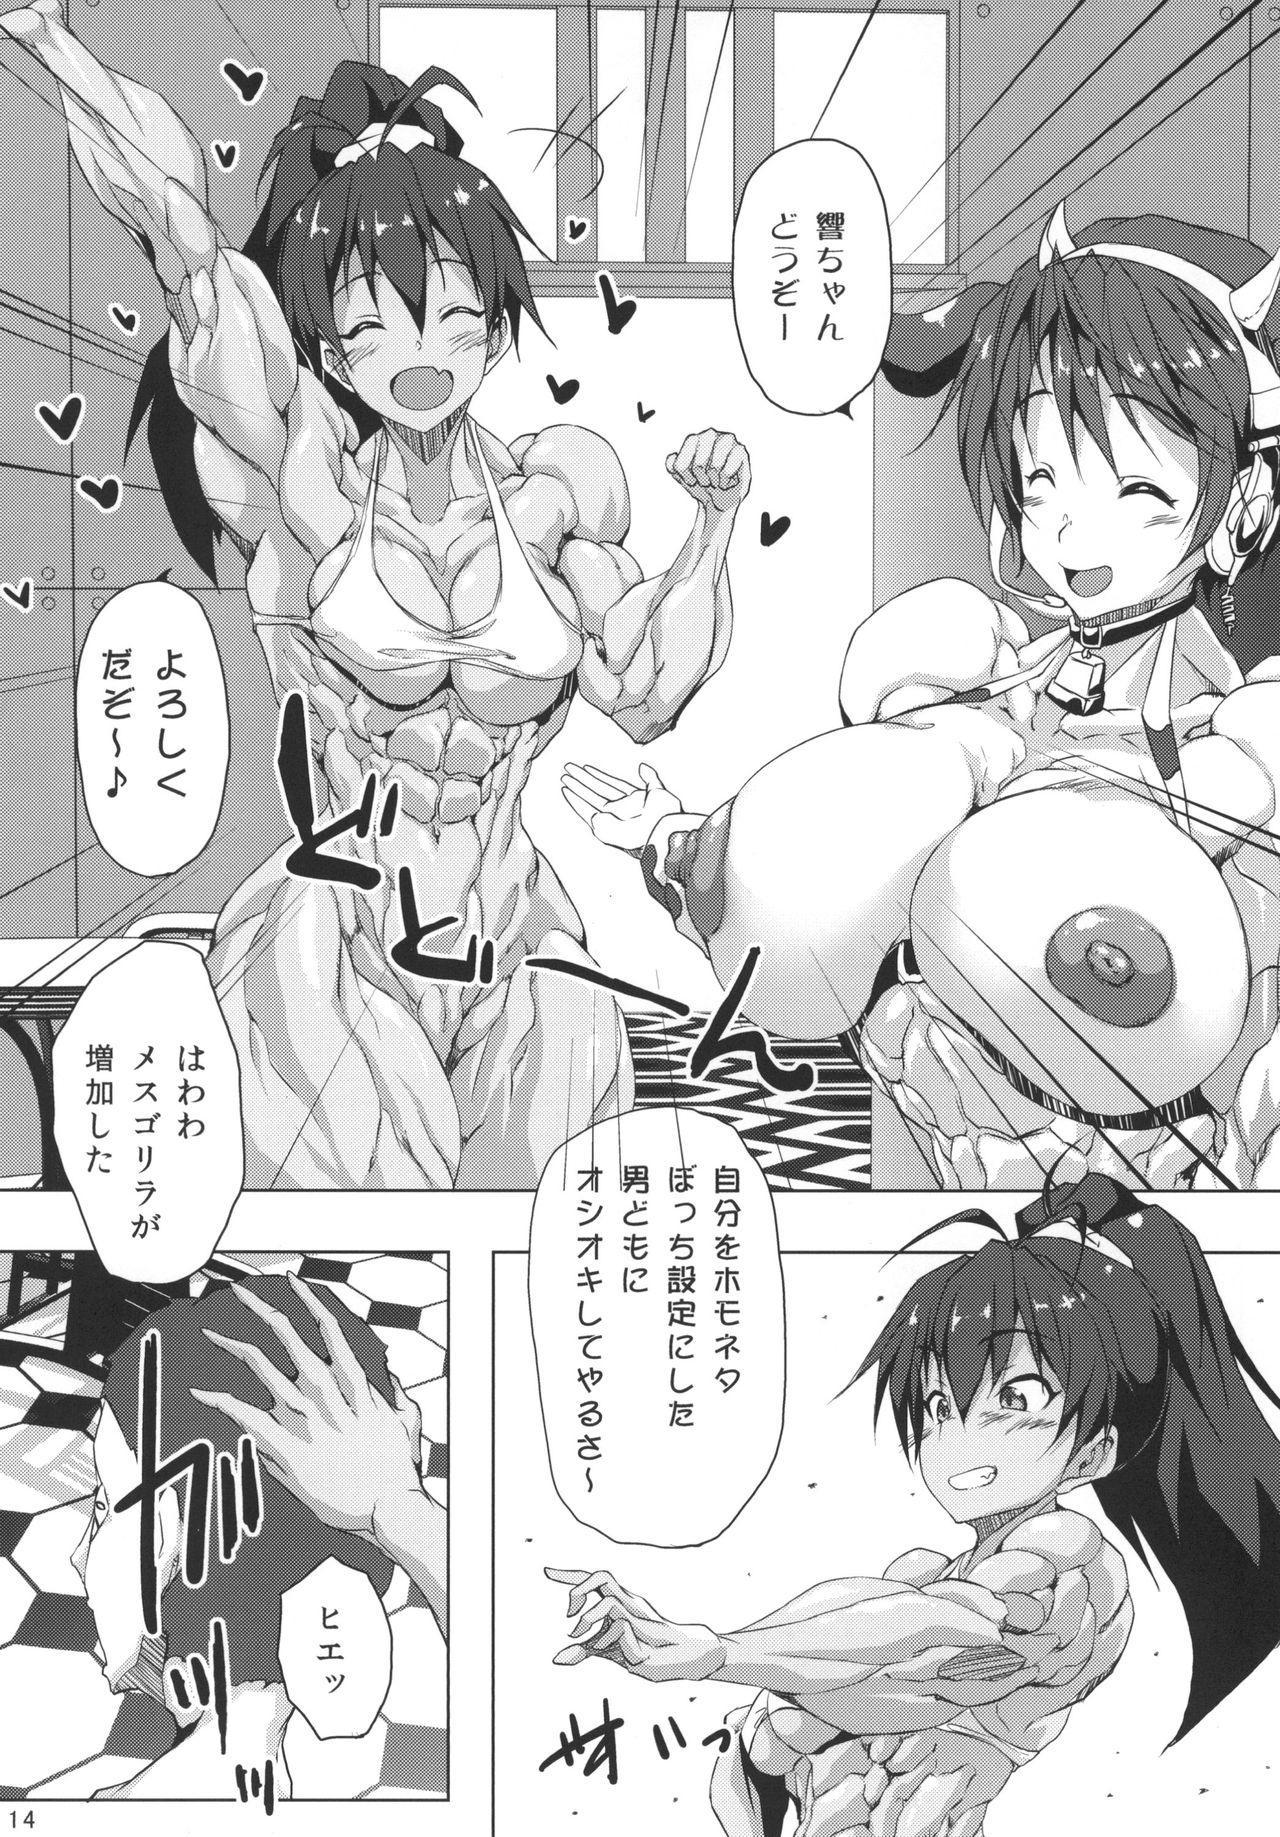 Kinniku Bokujou 13